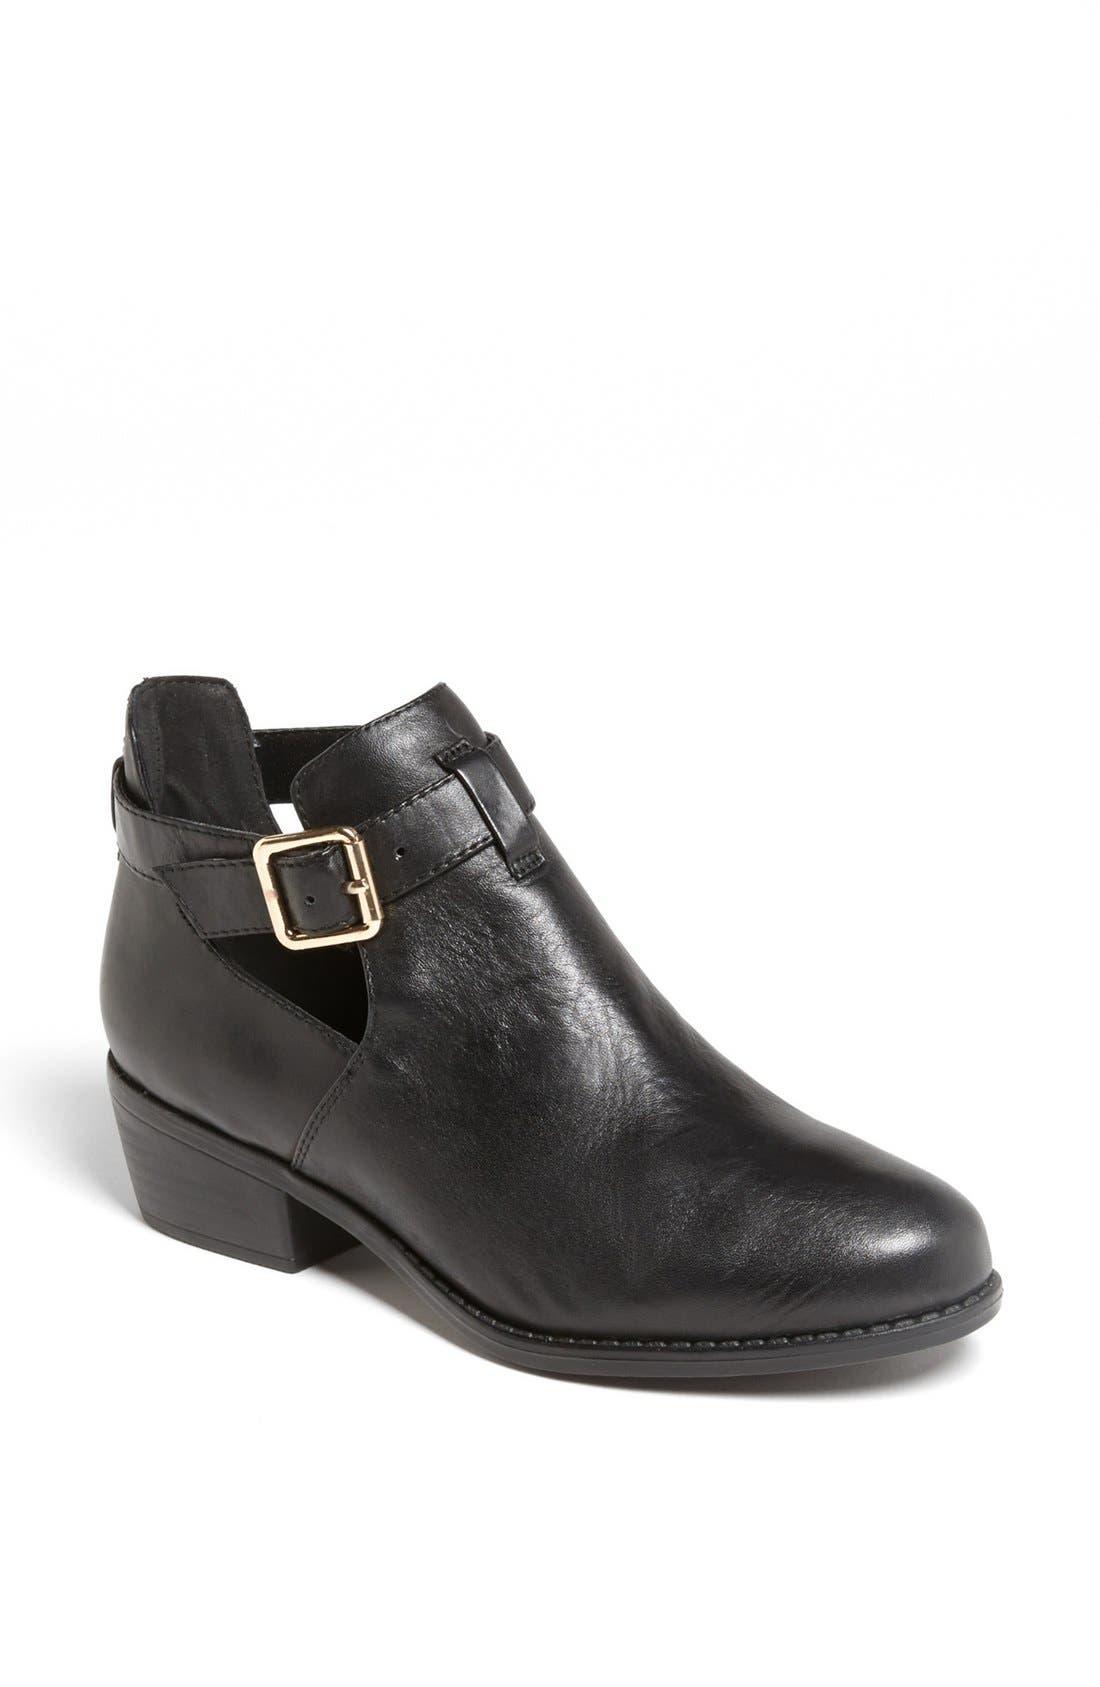 Main Image - Topshop 'Monti' Boot